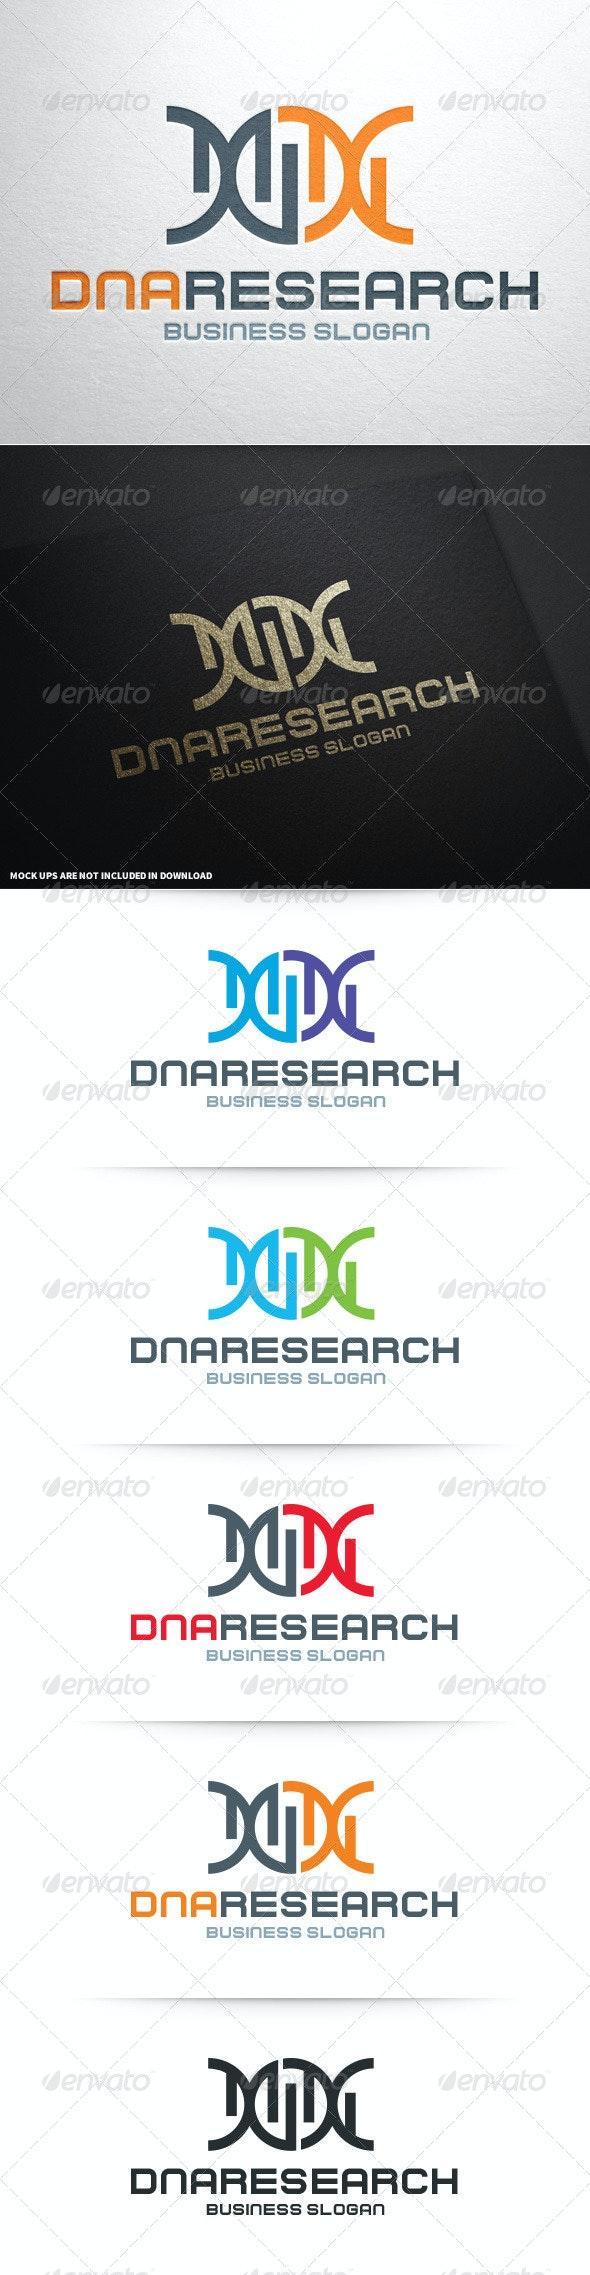 DNA Research Logo Template - Symbols Logo Templates